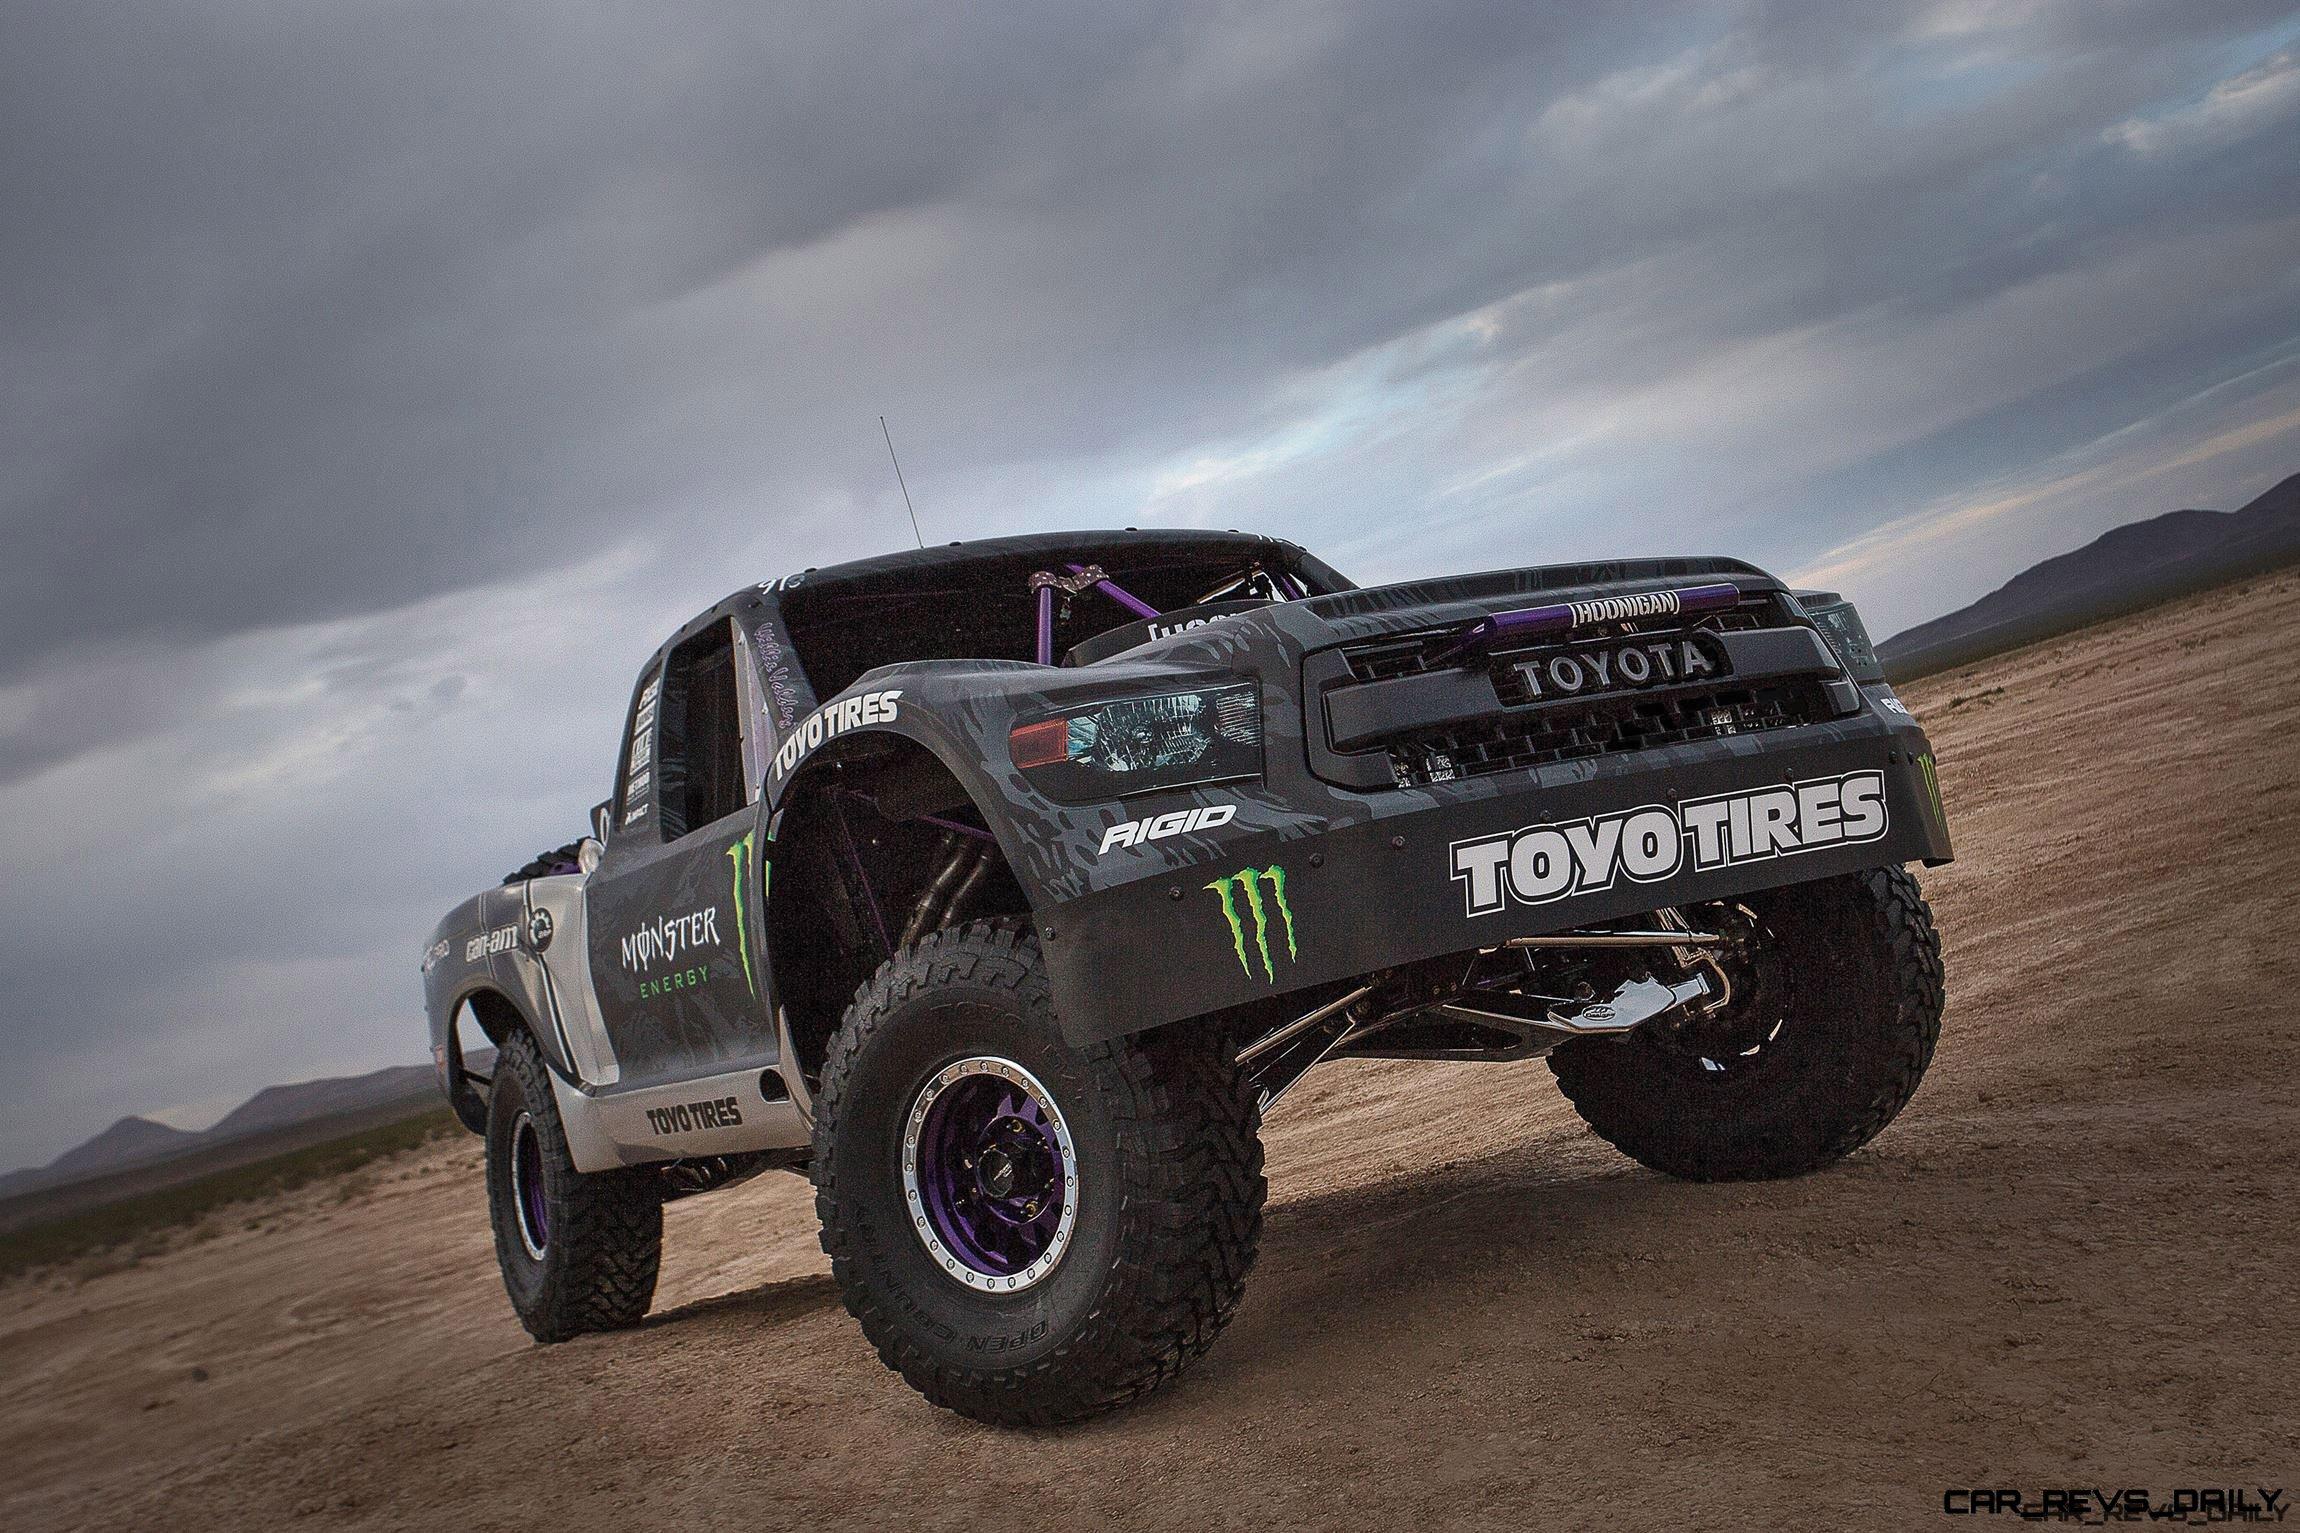 2016 TOYOTA TUNDRA TRD Pro Trophy Truck – Best in Baja?